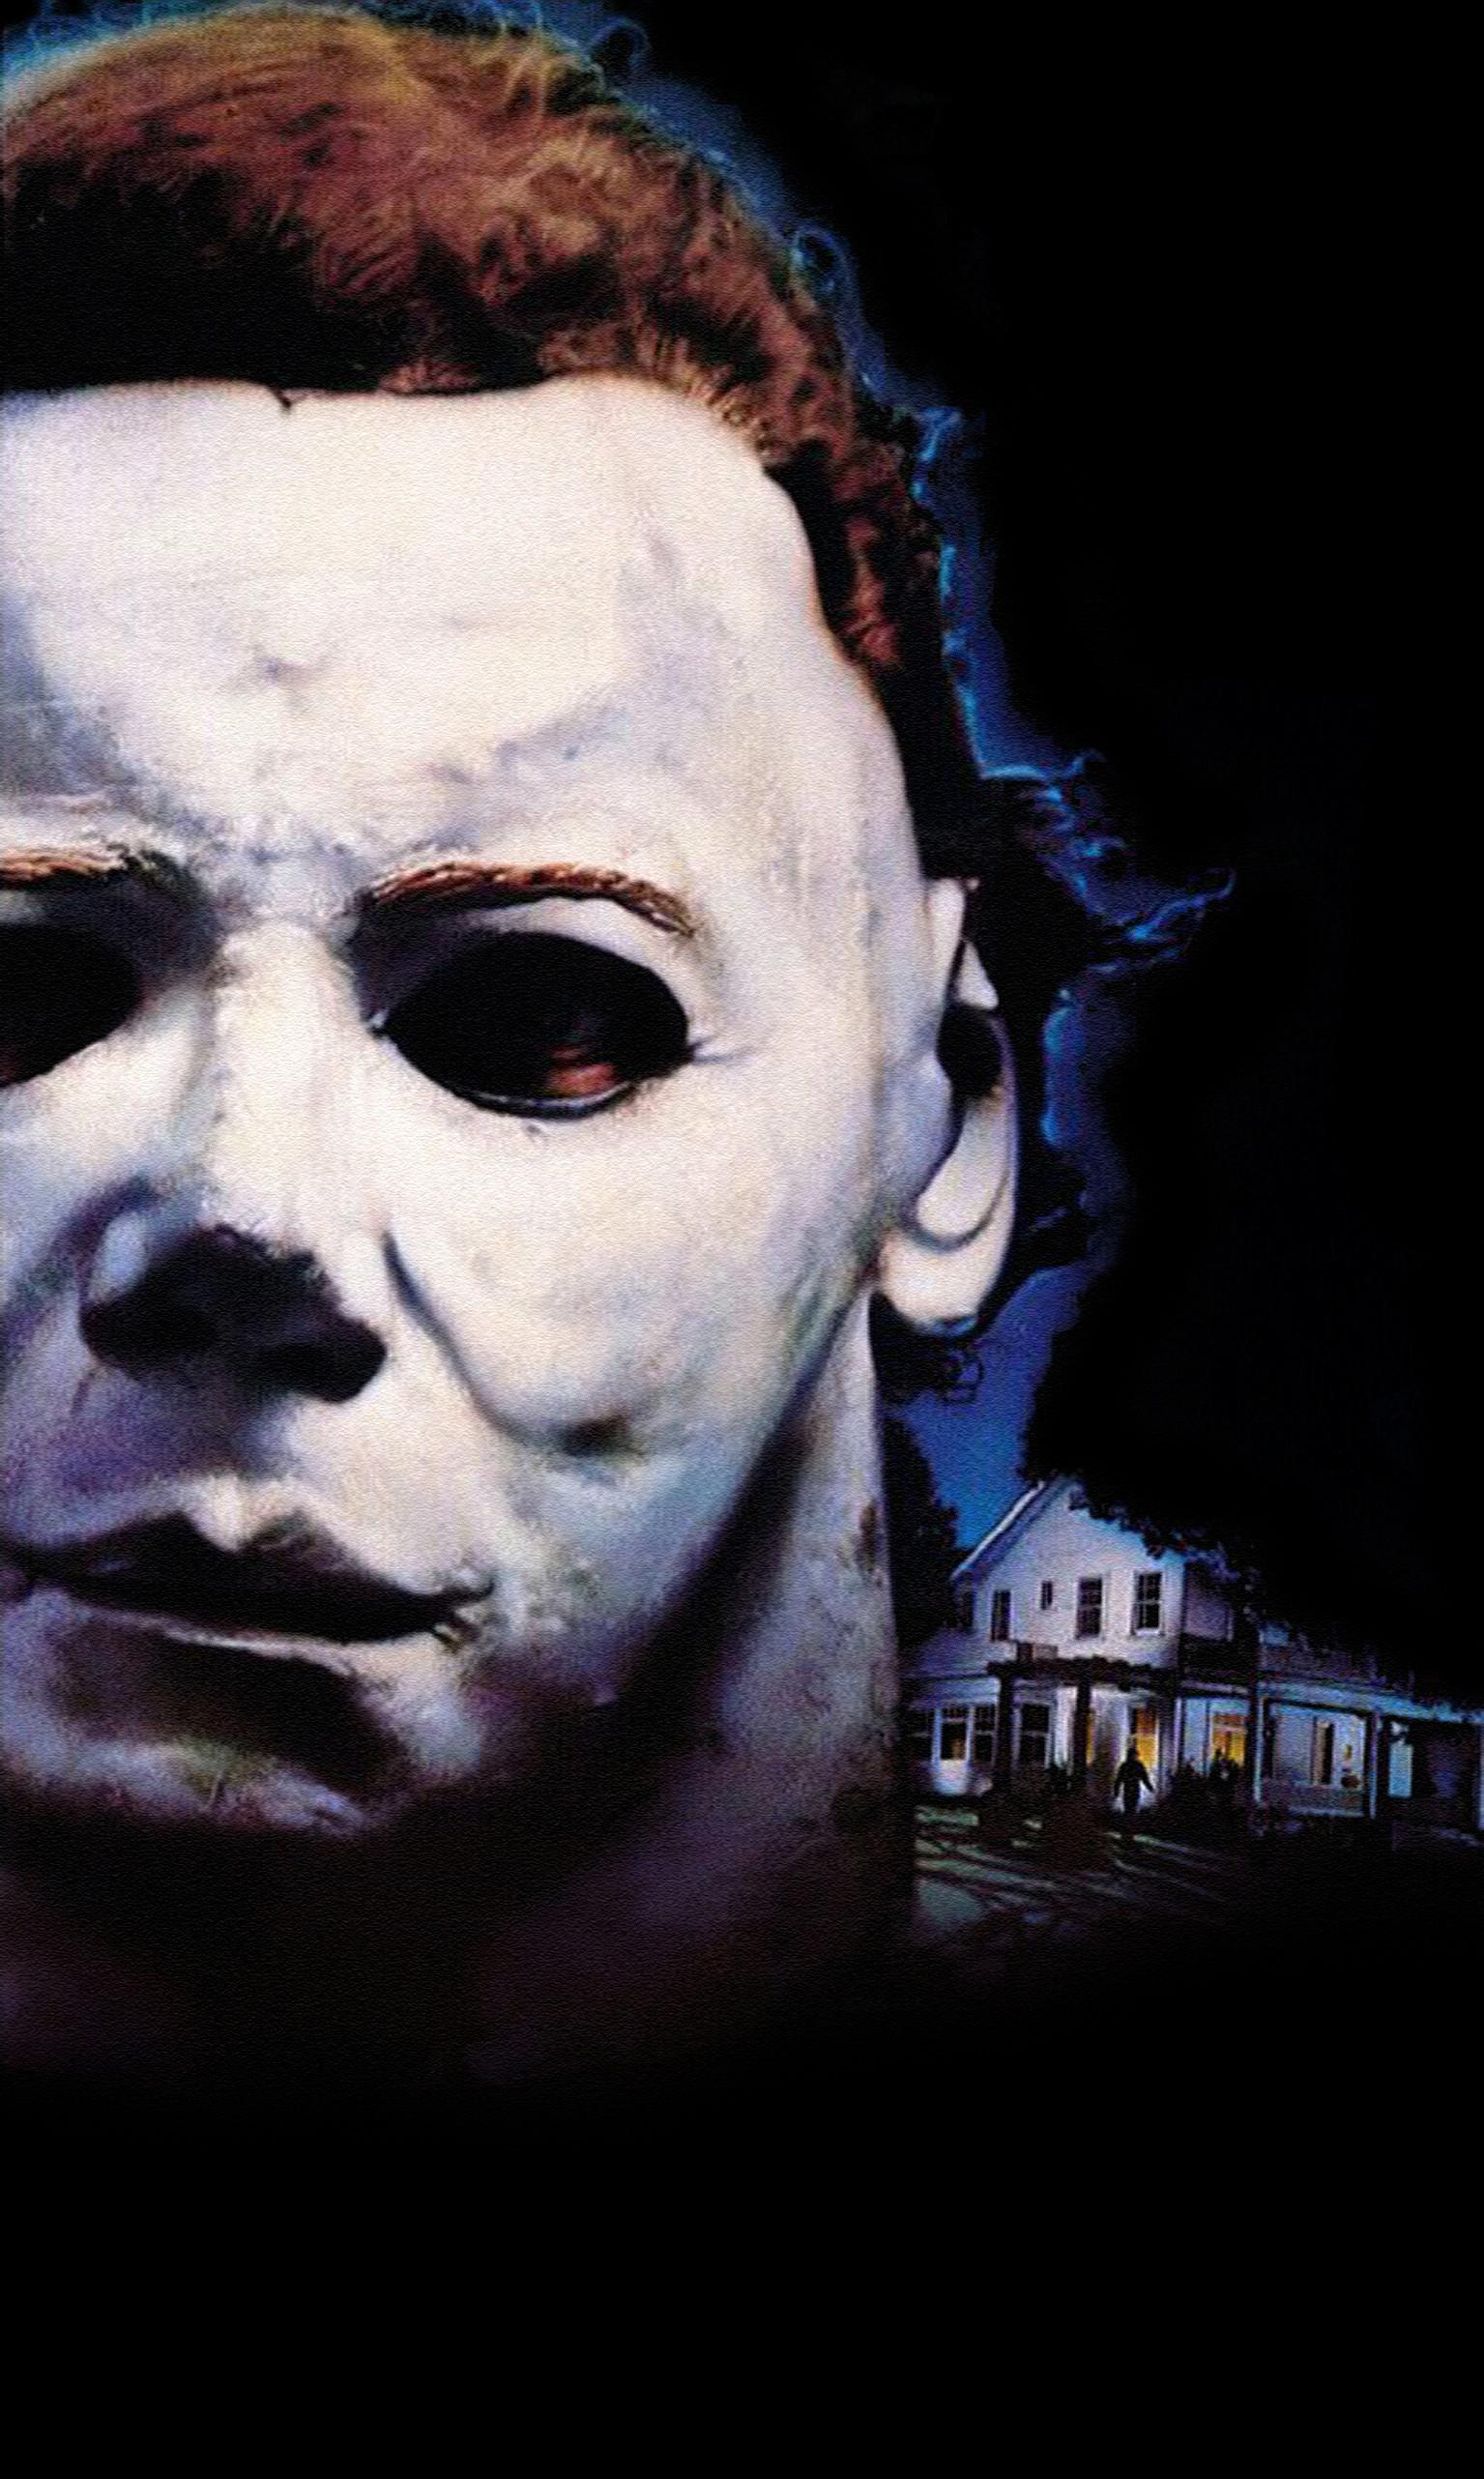 1920x1080 1920x1080 Wallpaper halloween 2, michael myers, young, boy, mask